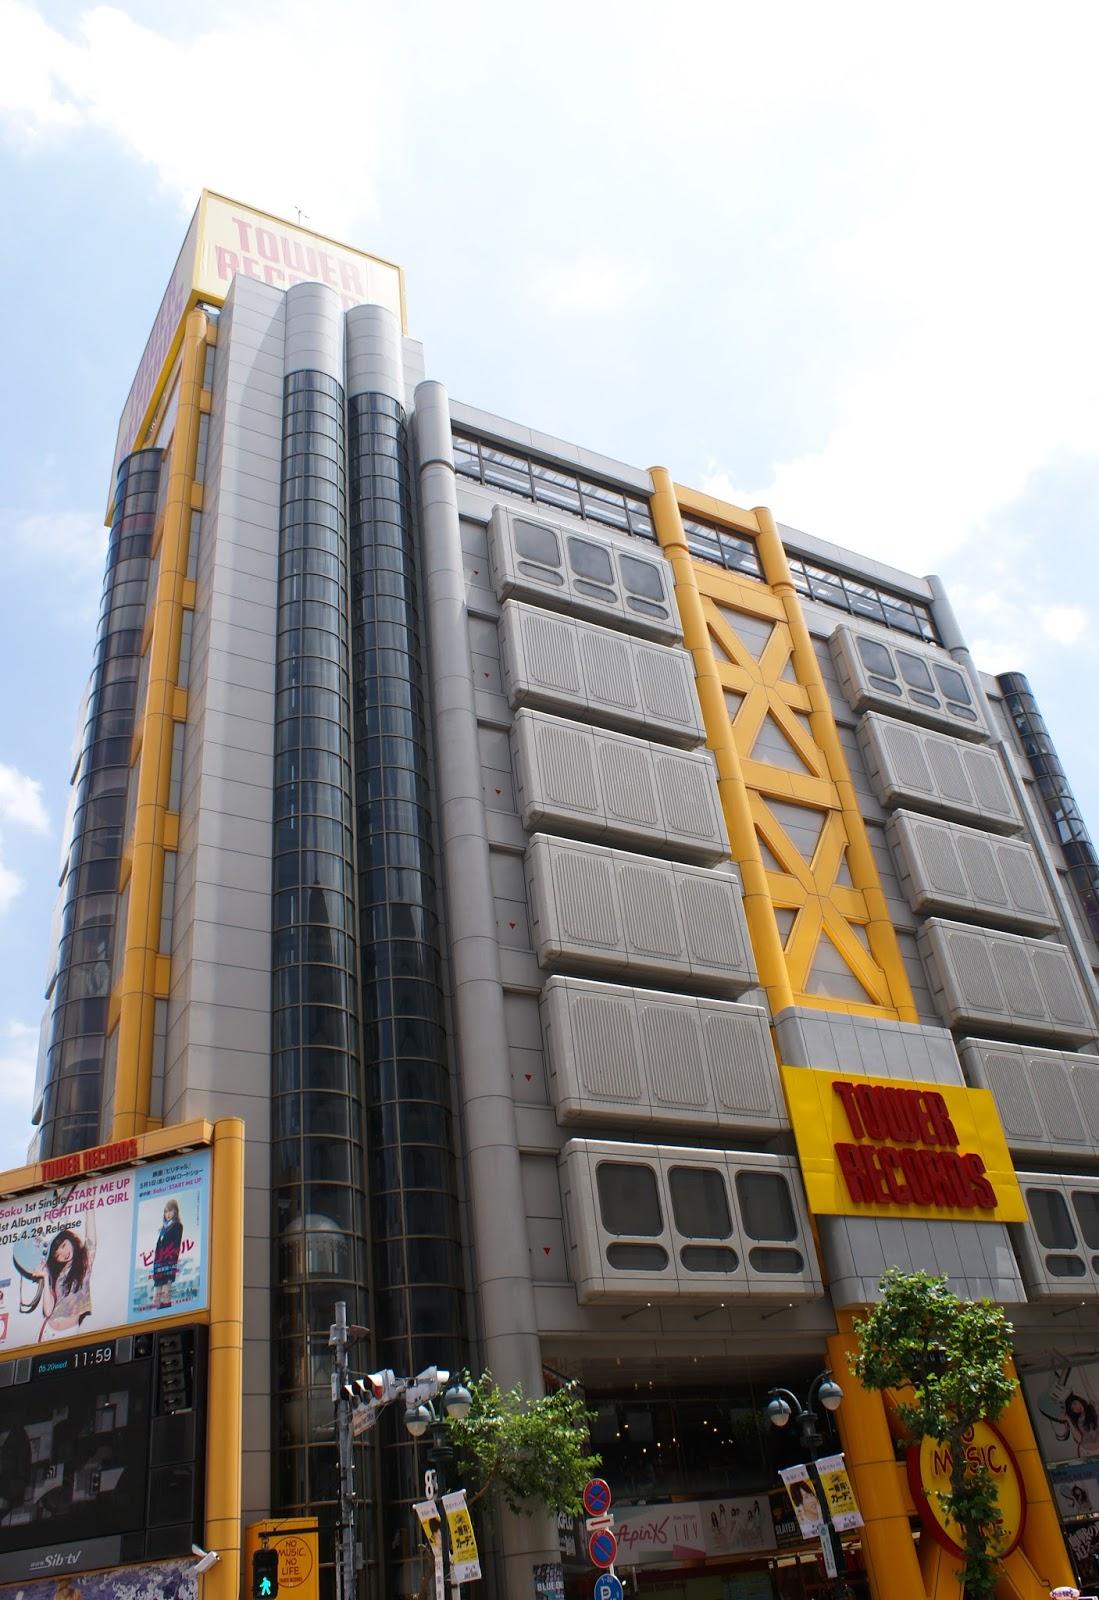 shibuya tokyo japon tower records